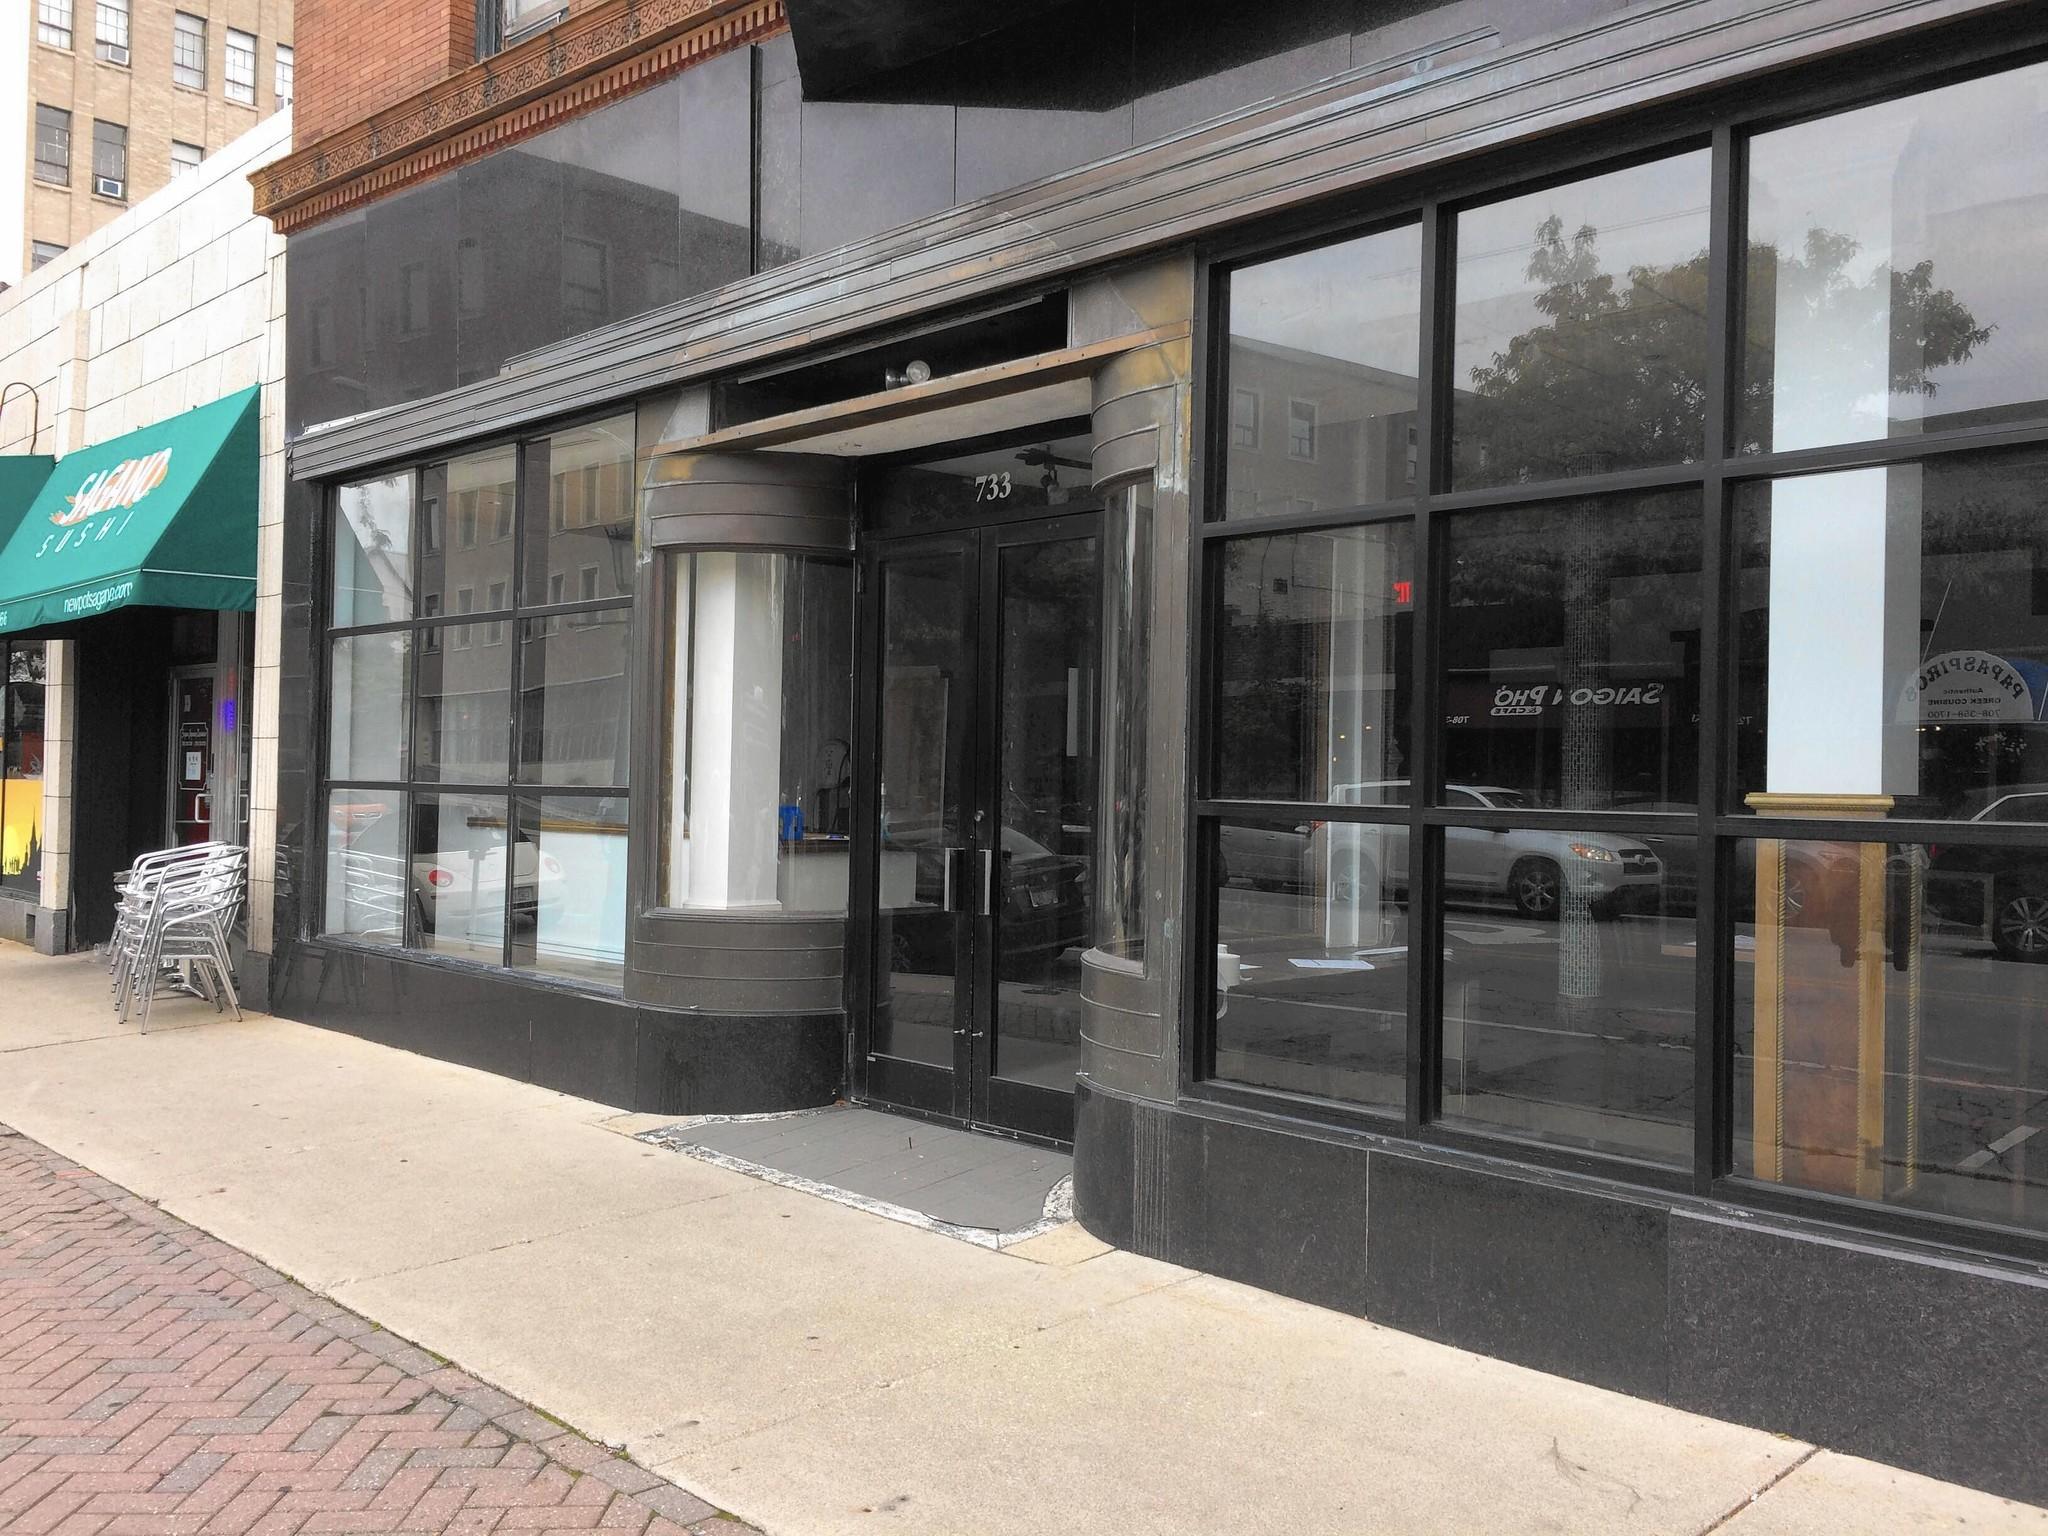 Scratch Kitchen headed to Oak Park looking to open in November